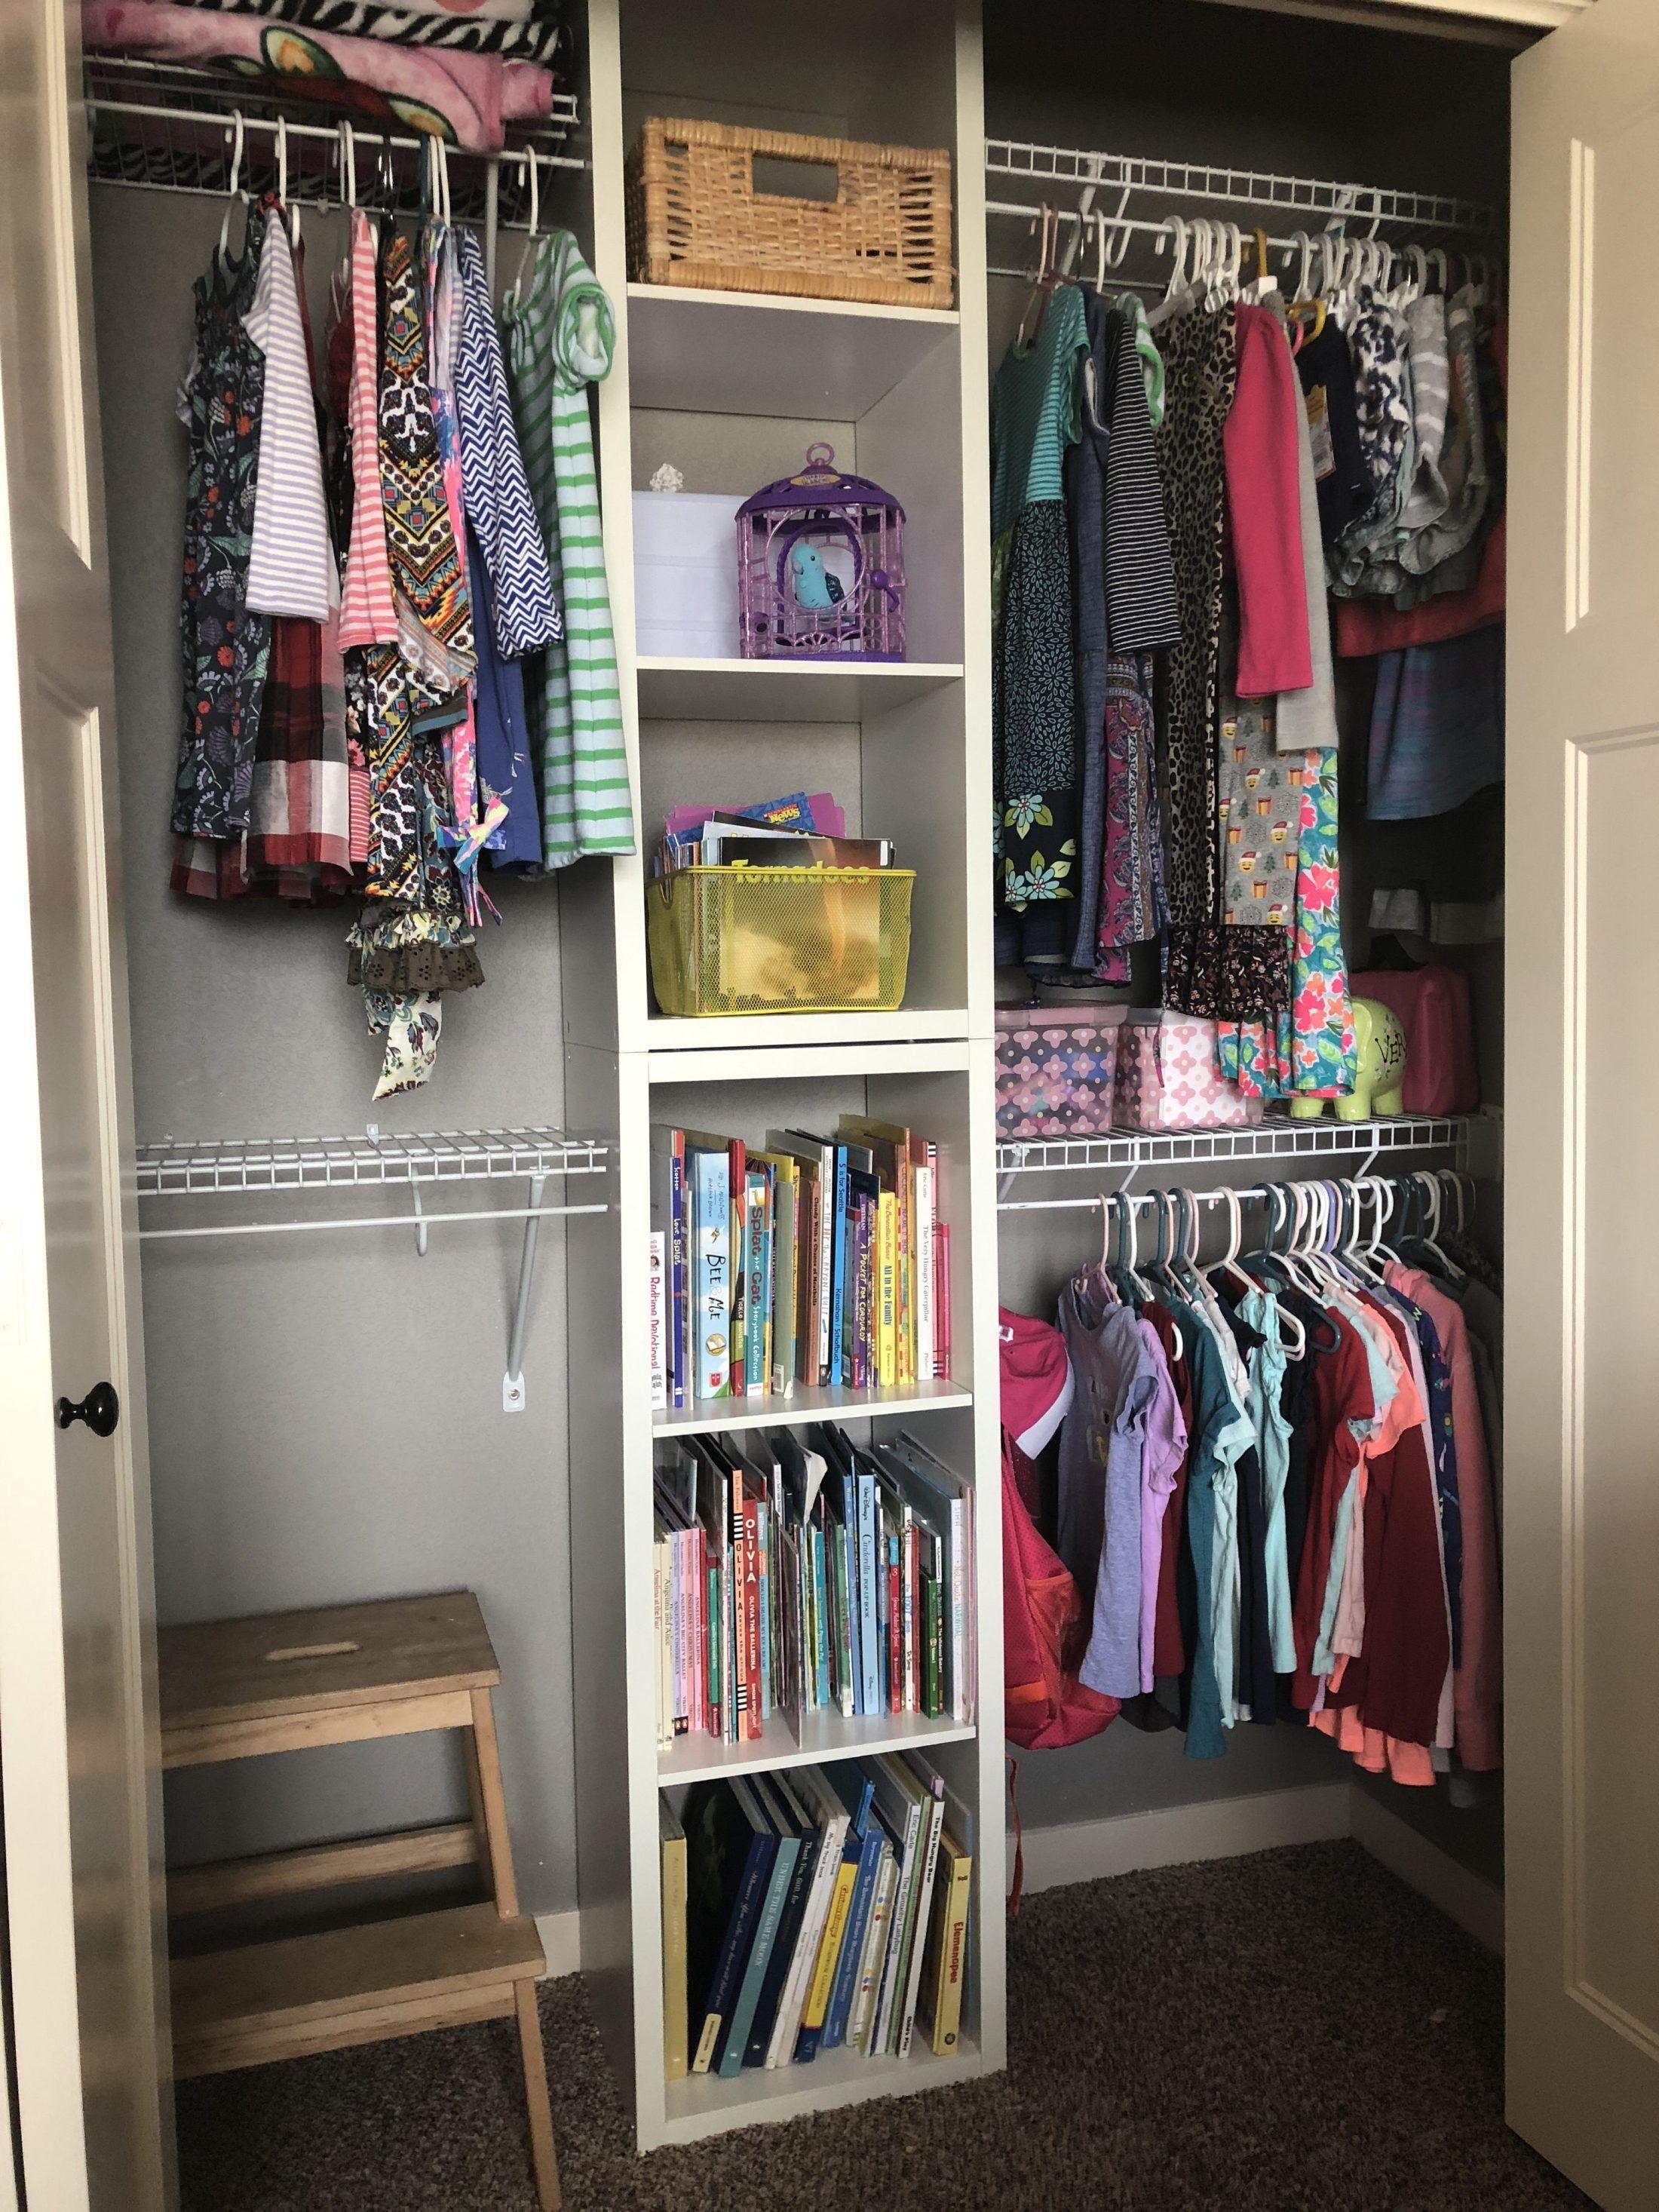 Home Depot Closet Organizer For Small Walk In Closets Home Depot Closet Best Closet Organization Closet Layout